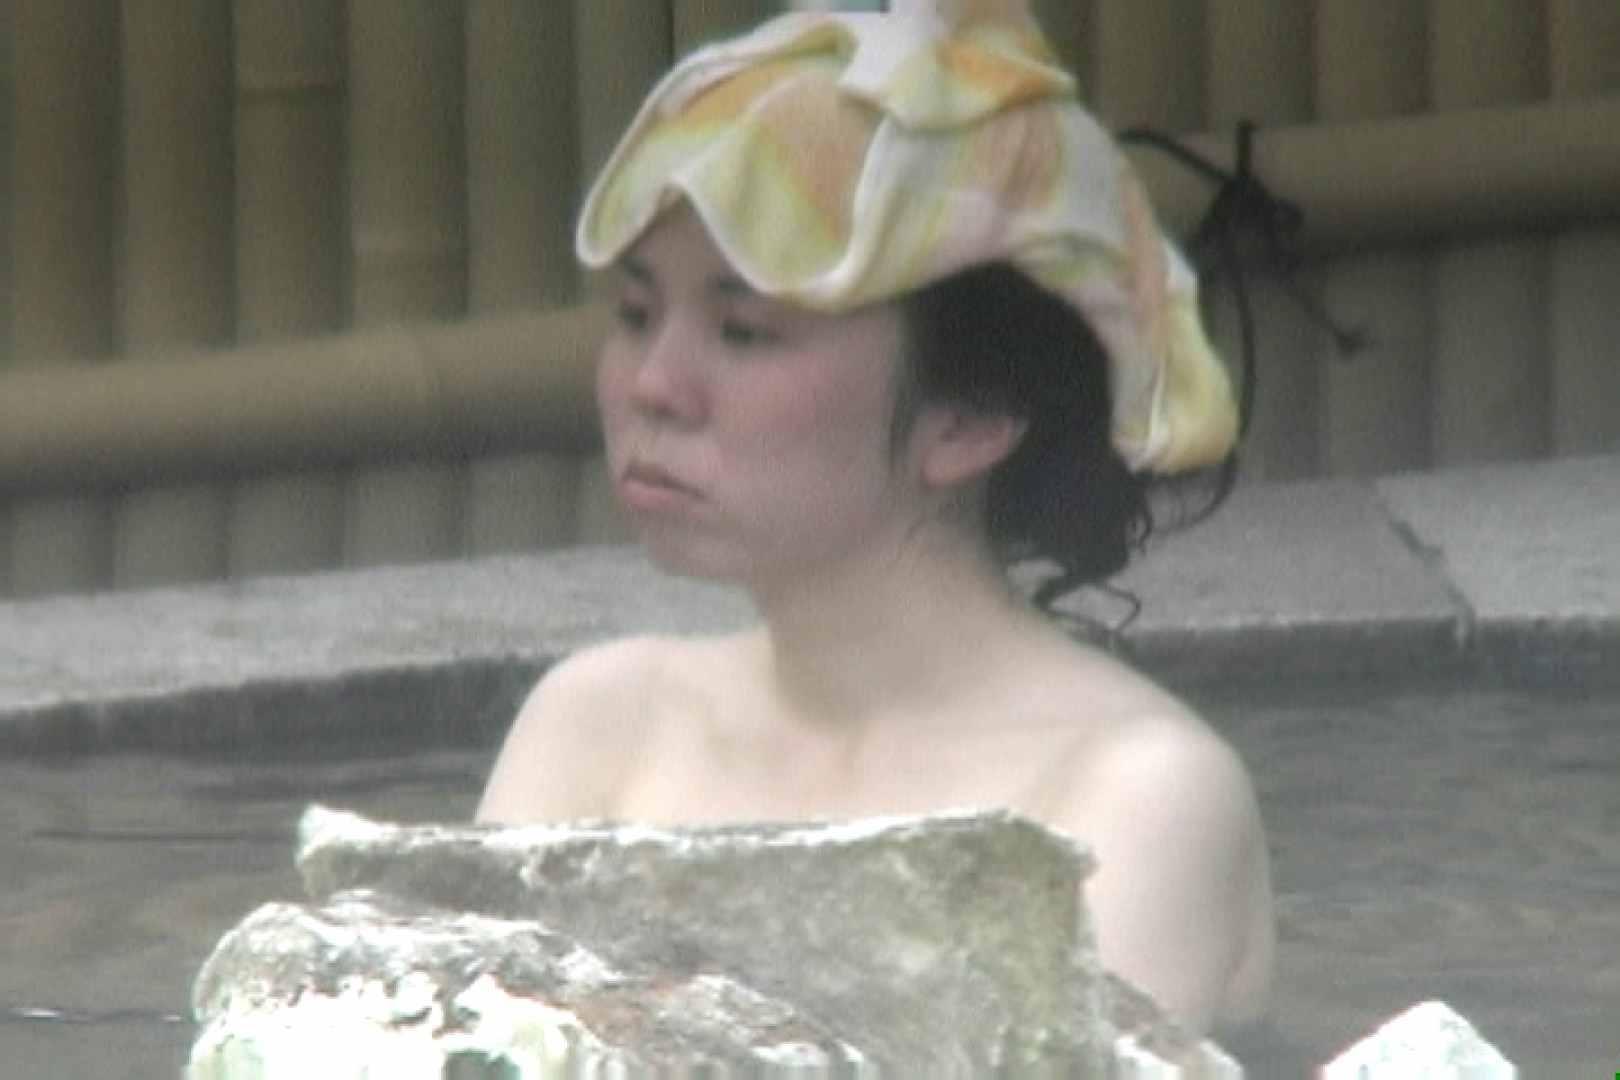 Aquaな露天風呂Vol.687 盗撮シリーズ | 露天風呂編  93PIX 45